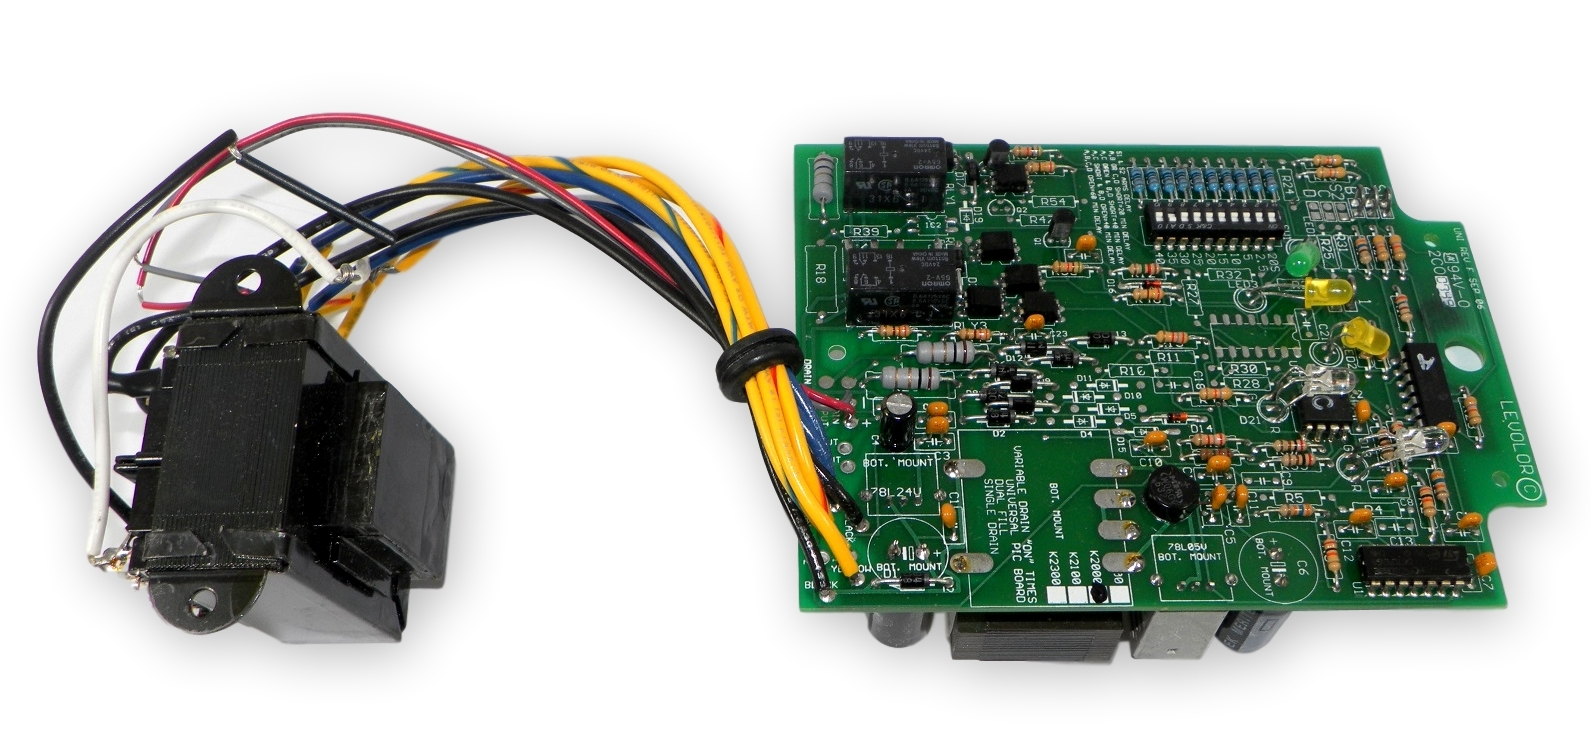 Jandy Levolor K2000110bdt Pcb Board W Transformer Xfmr K 2000 110v Zodiac Printed Circuit Replacement Kit For Aqualink Pool Responsive Image